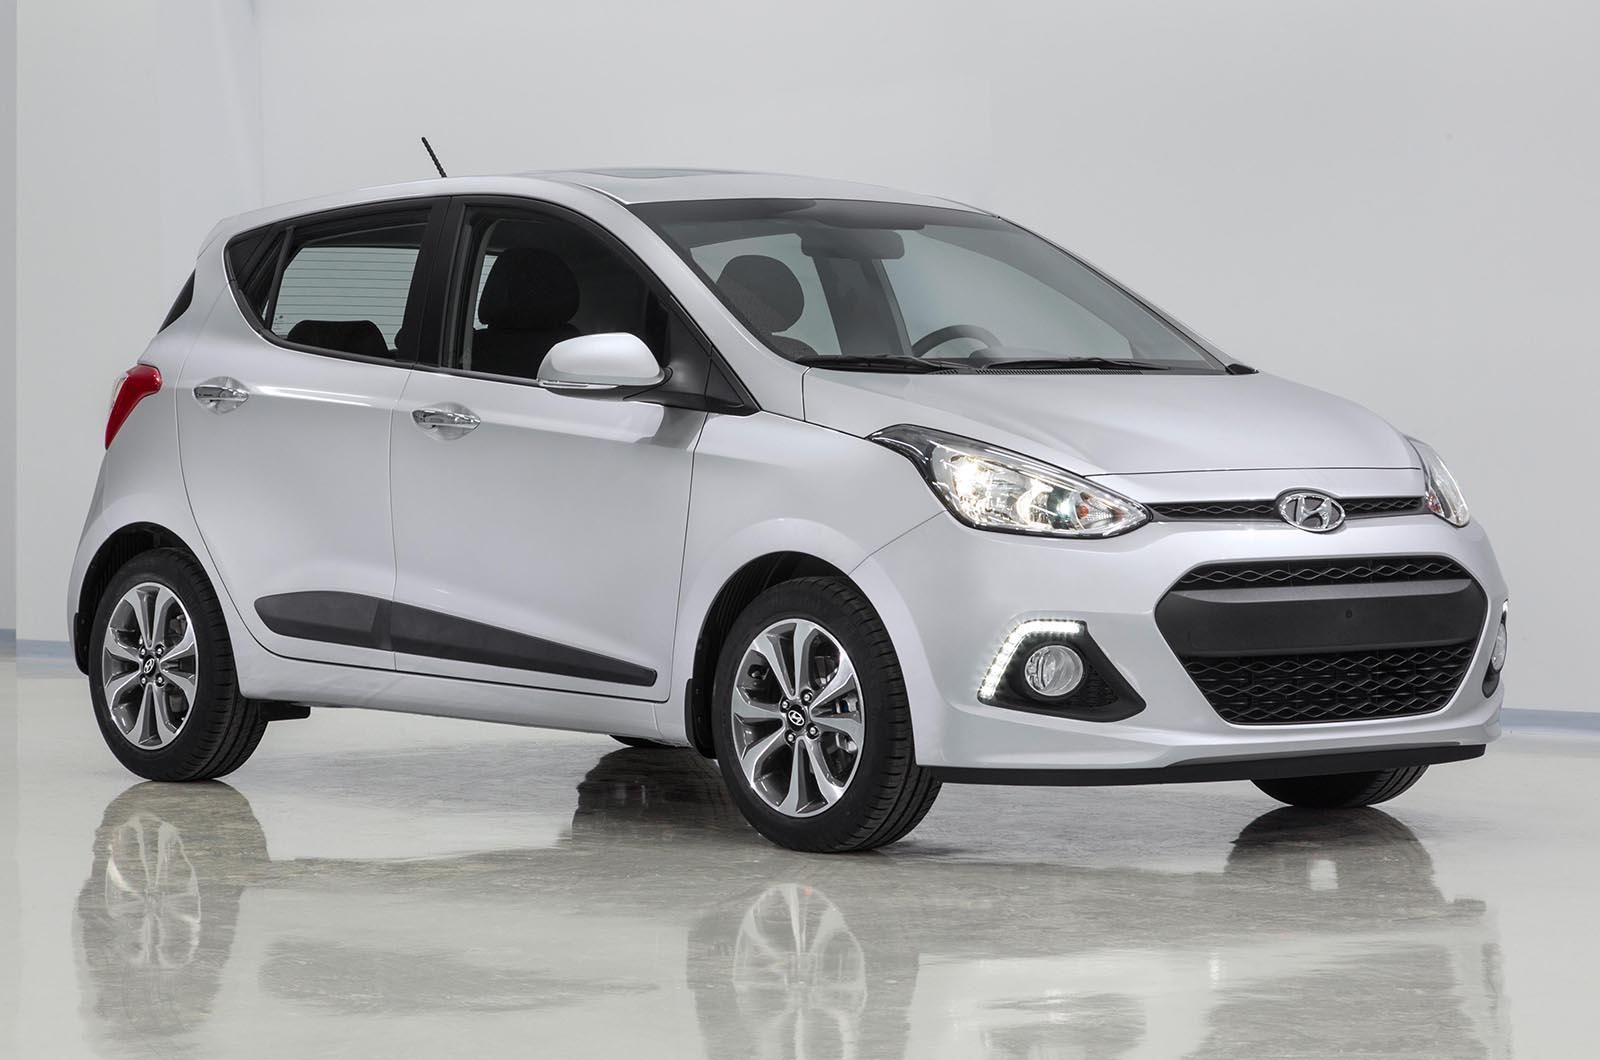 new 2014 hyundai i10 revealed car news budget hatchbacks autocar india. Black Bedroom Furniture Sets. Home Design Ideas